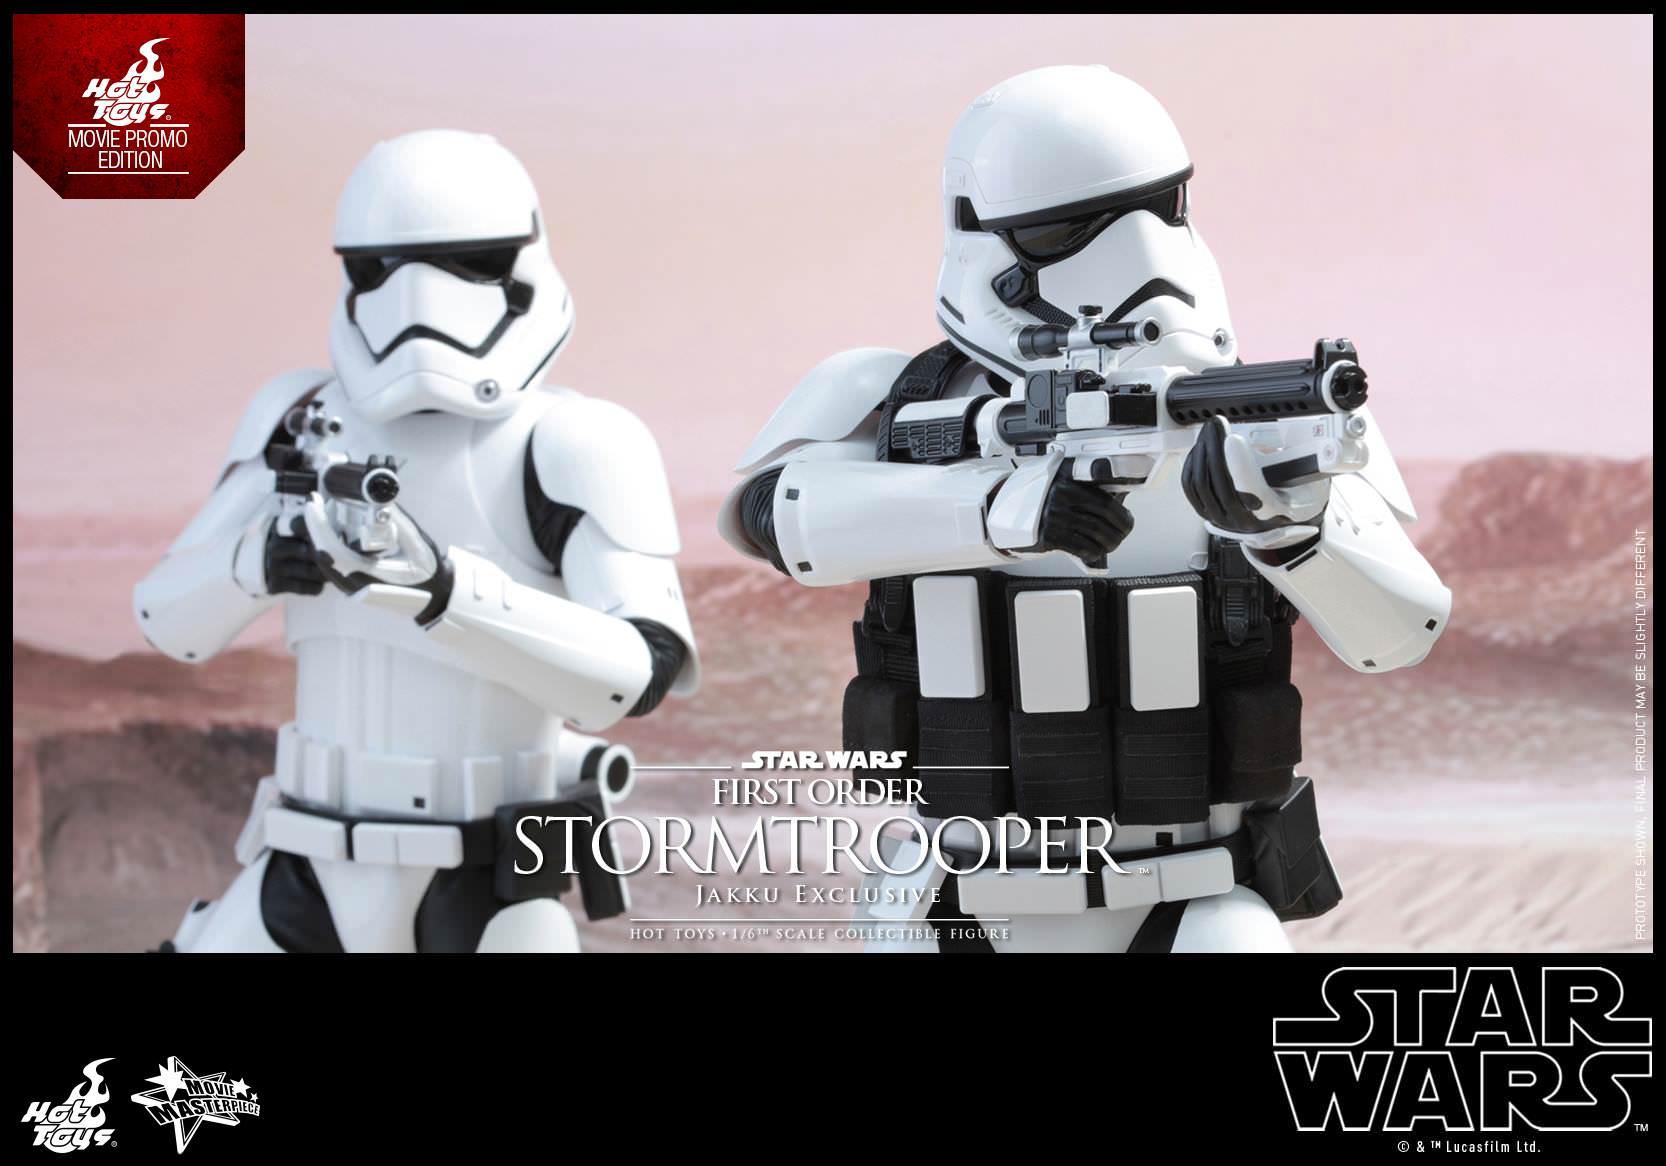 NEW Jakku Exclusive Hot Toys MMS 333 Star Wars First Order Stormtrooper